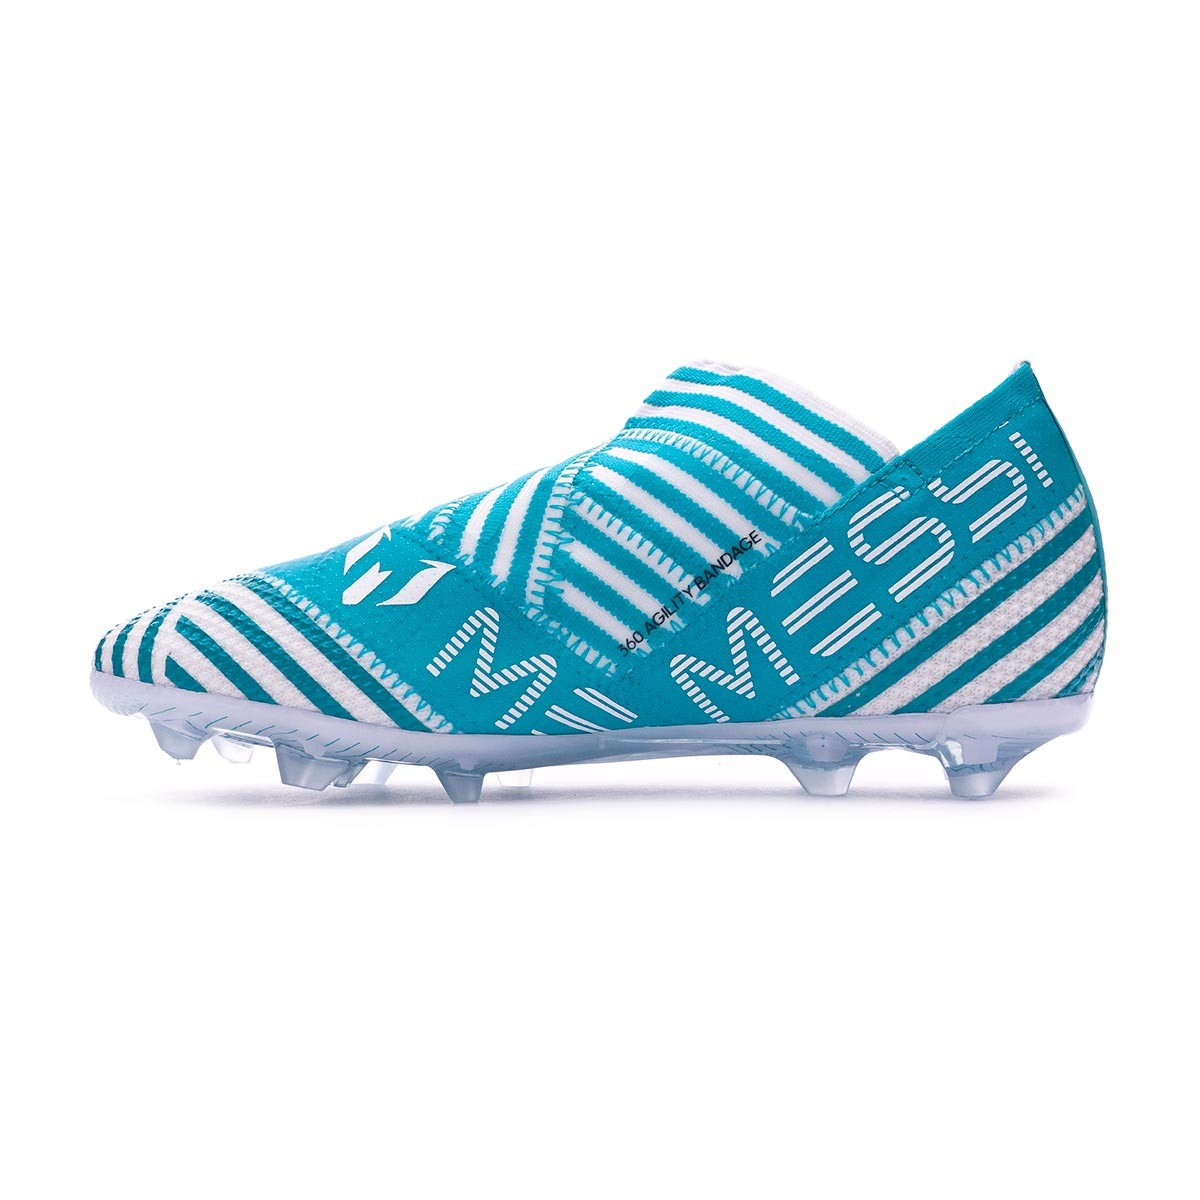 8c5283c39386 Football Boots adidas Kids Nemeziz Messi 17+ 360 Agility FG Legend  ink-Solar yellow-Energy blue - Football store Fútbol Emotion